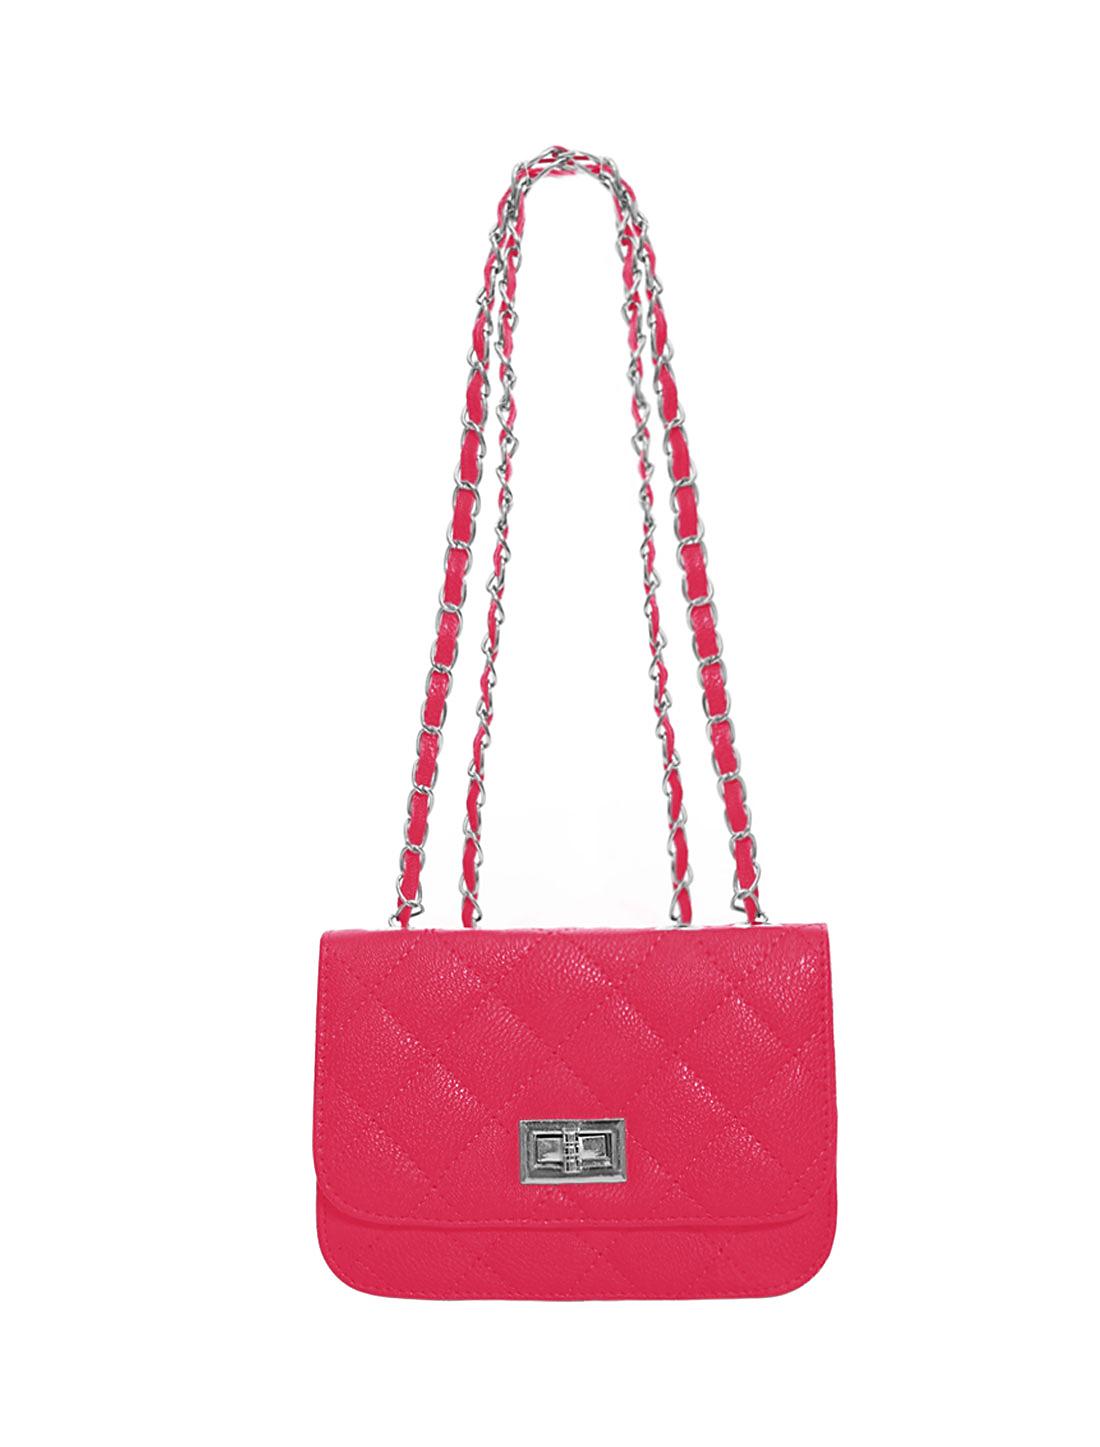 Women Turn-Lock Clasp Argyle Design Interior Zipper Pocket Shoulder Bag Fuchsia